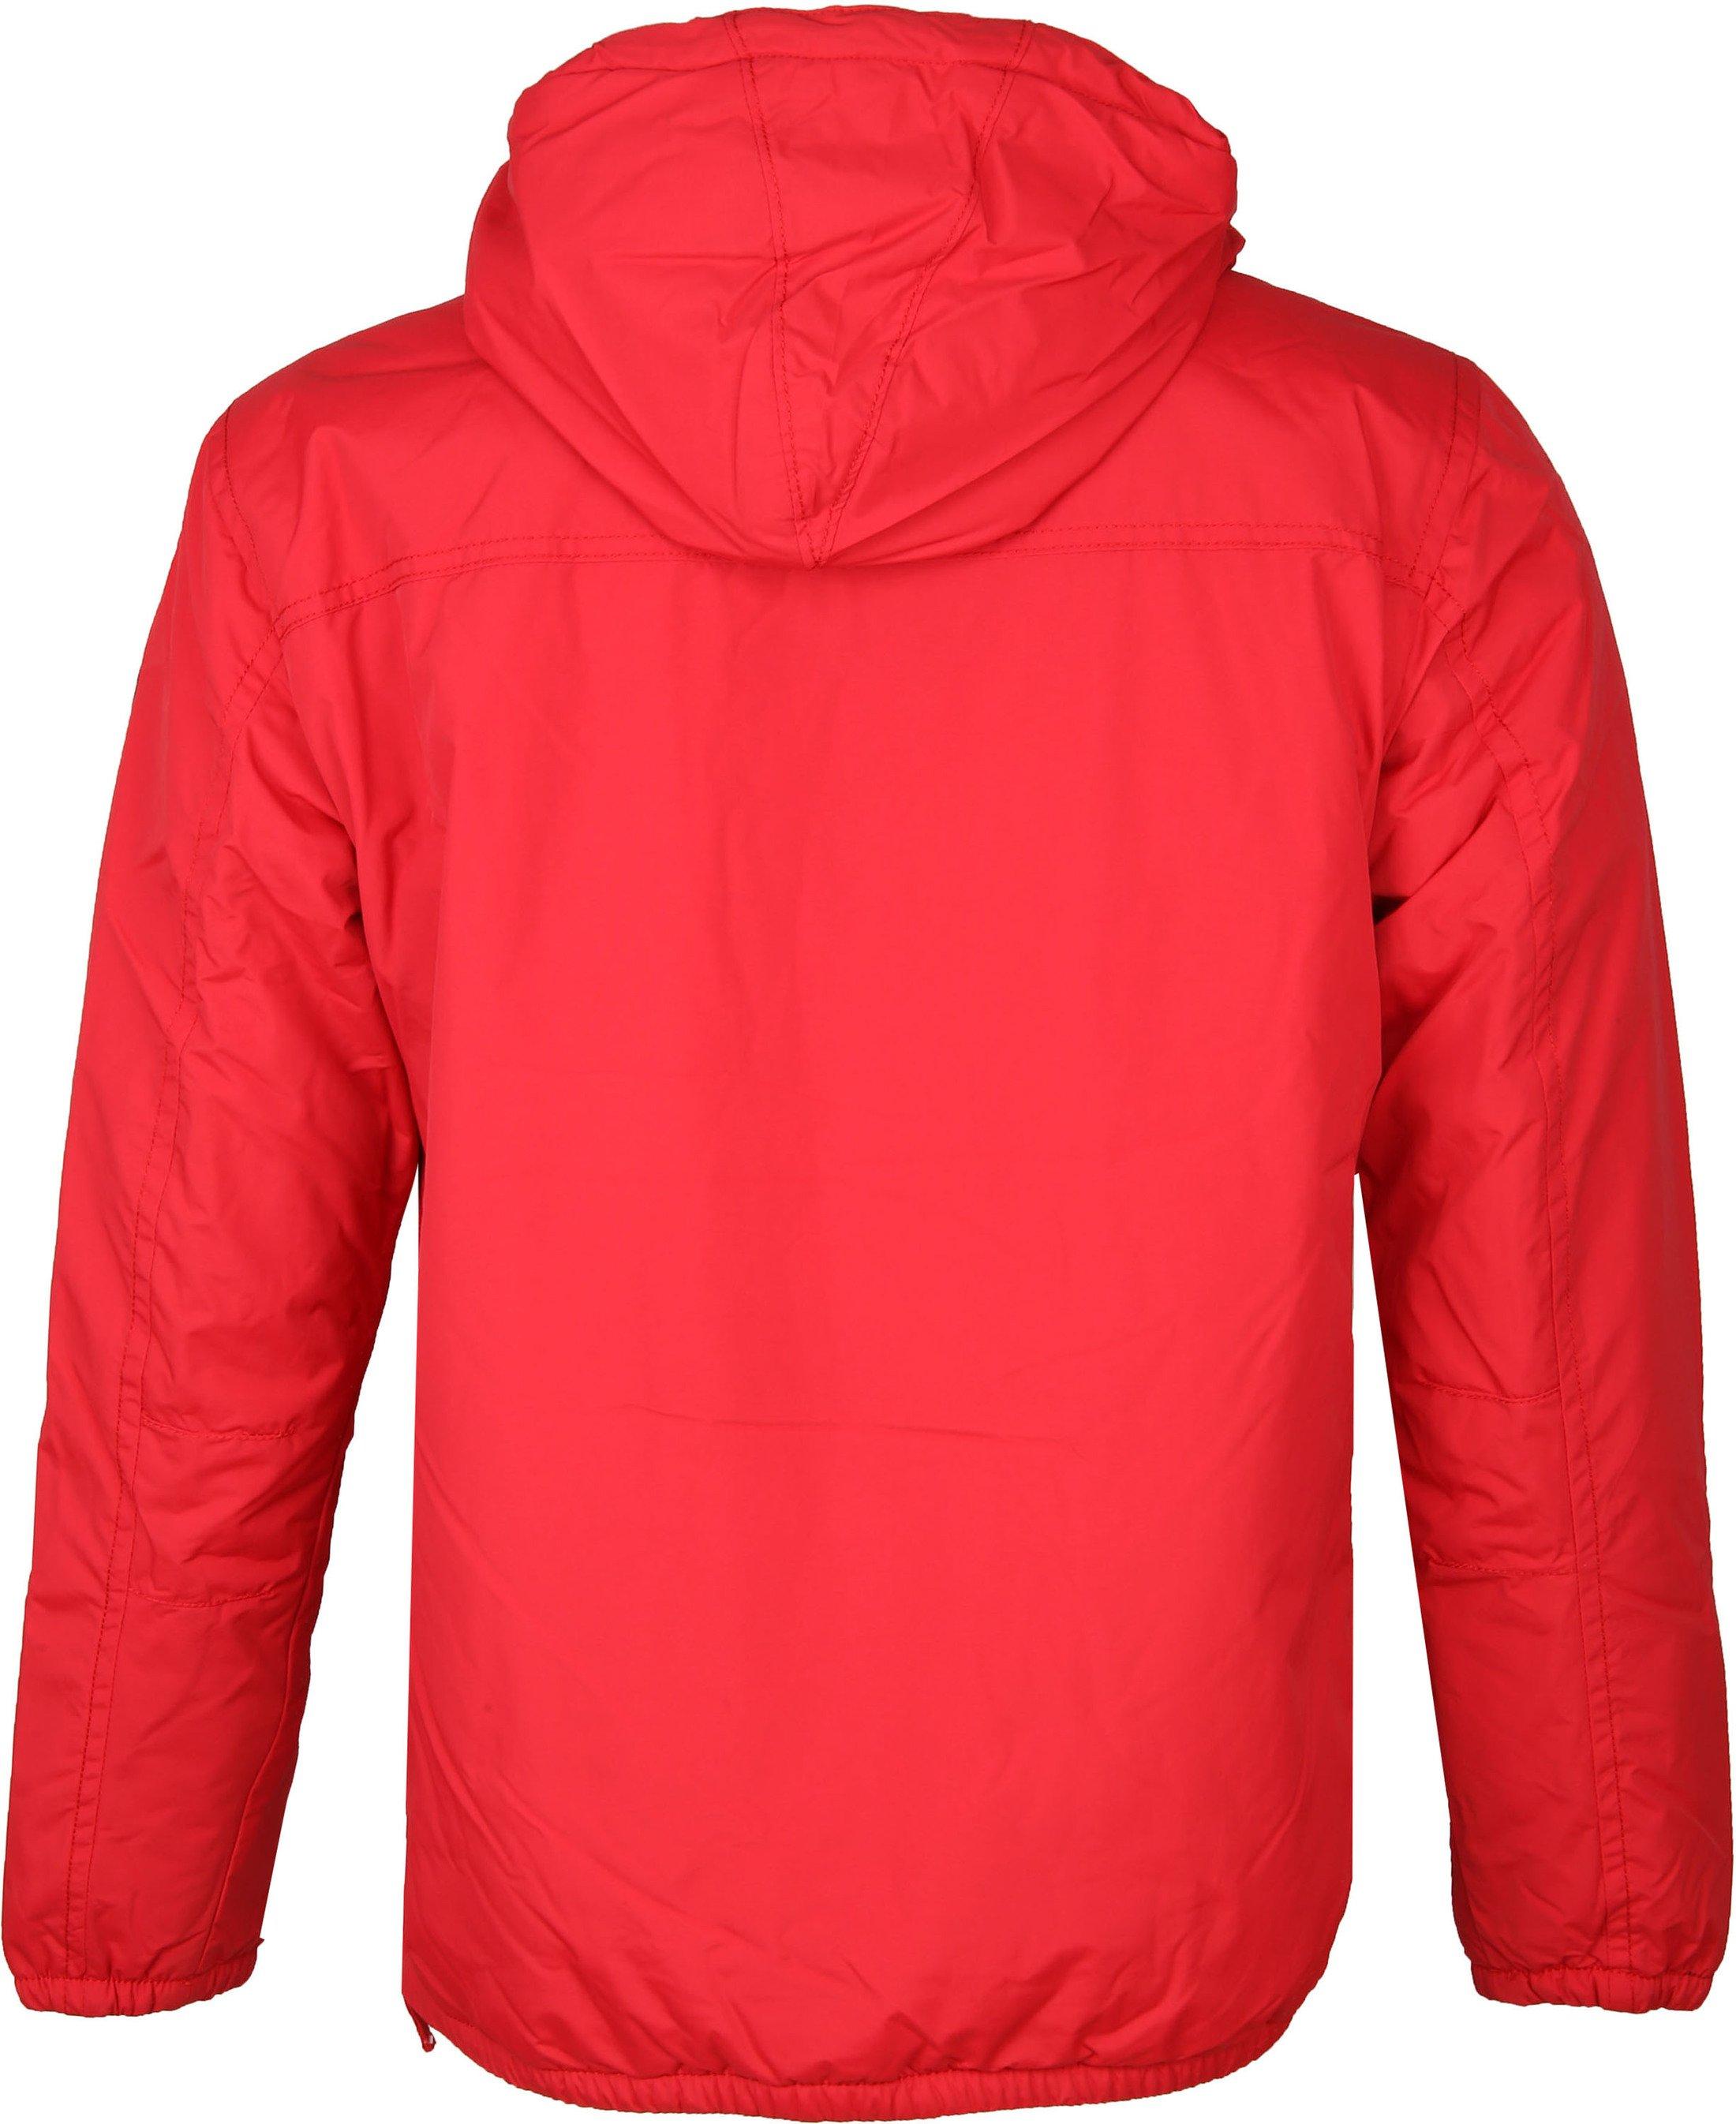 Napapijri Rainforest Jacket Red